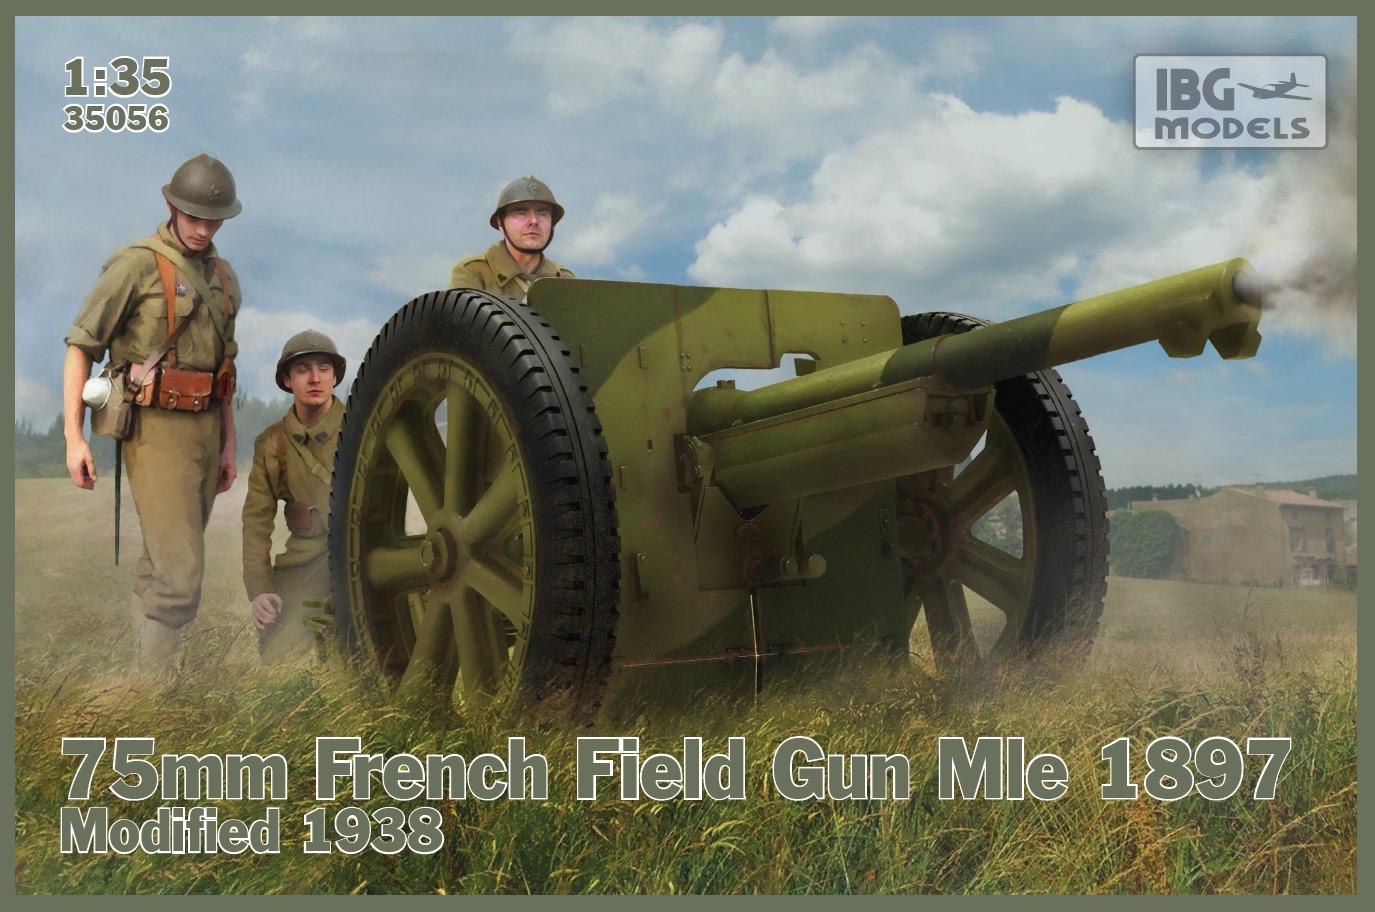 1/35 75mm French Field Gun Mle 1897 – Modified 1938 35056